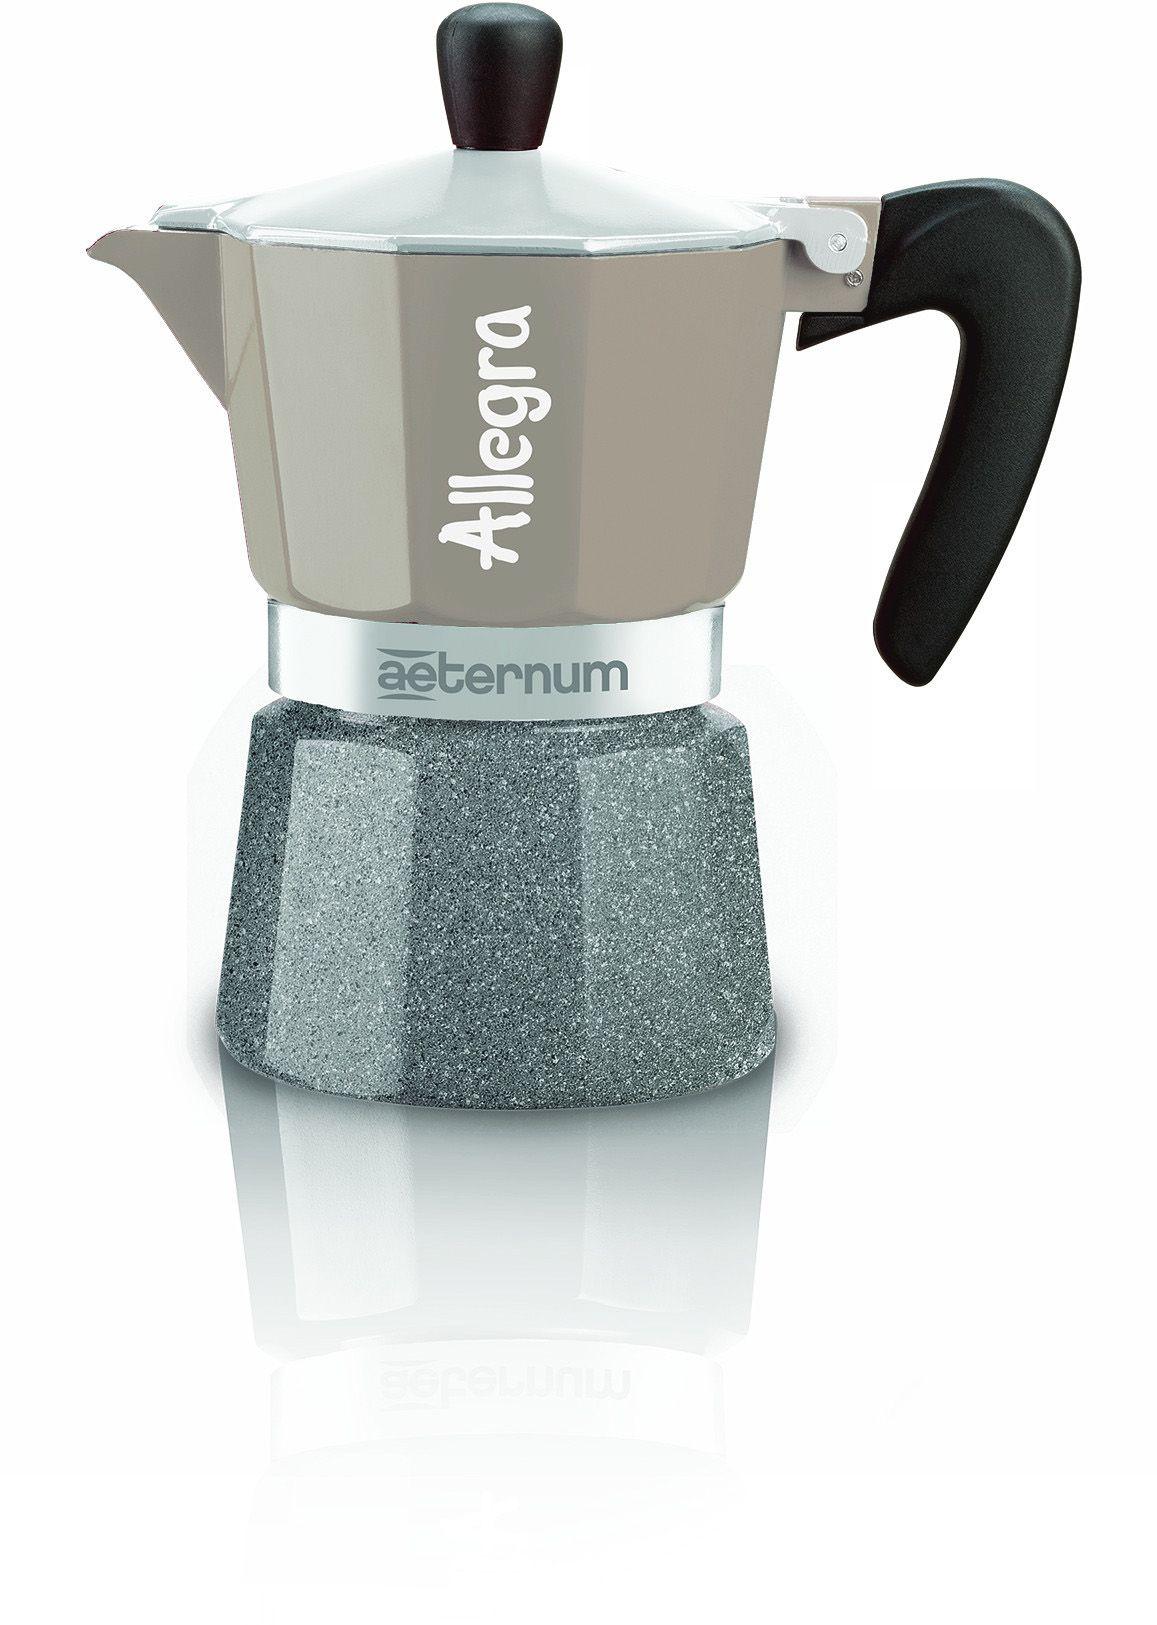 AETERNUM BY BIALETTI Aeternum by Bialetti Espressokocher, Aluminium, 3 Tassen, »ALLEGRA«